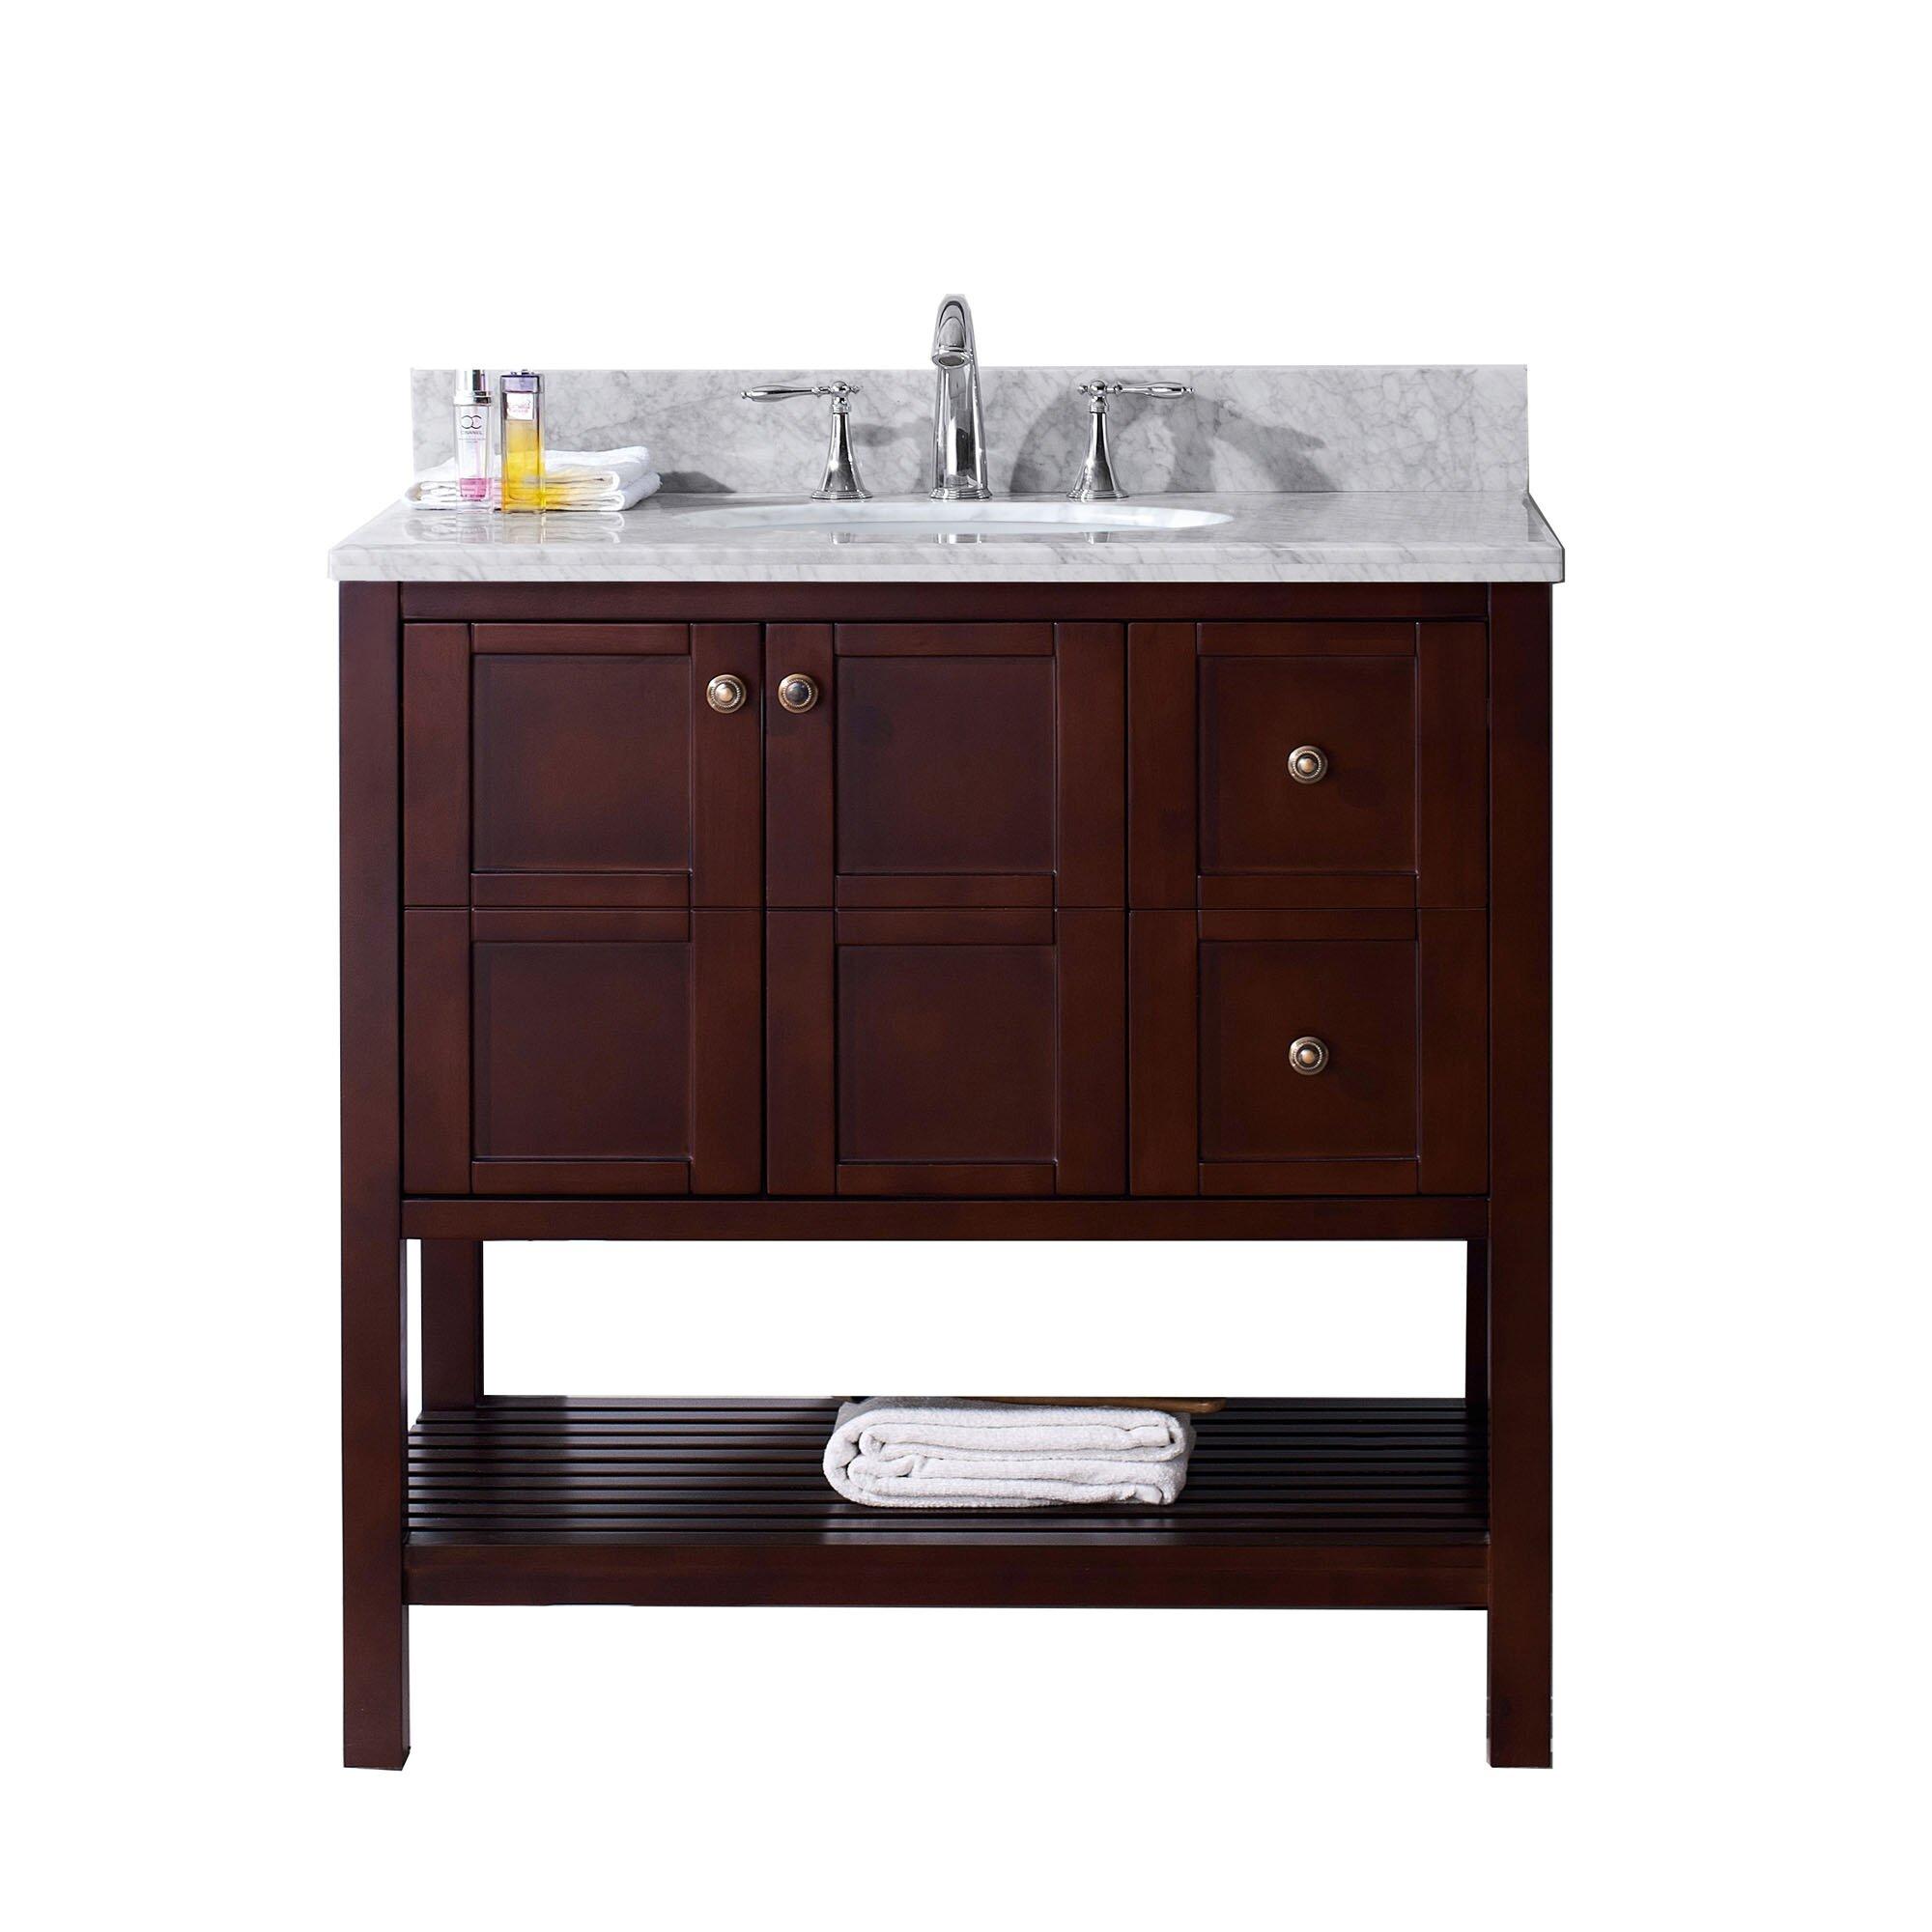 Virtu Winterfell 36 Single Bathroom Vanity Set With Carrara White Top And Mirror Reviews